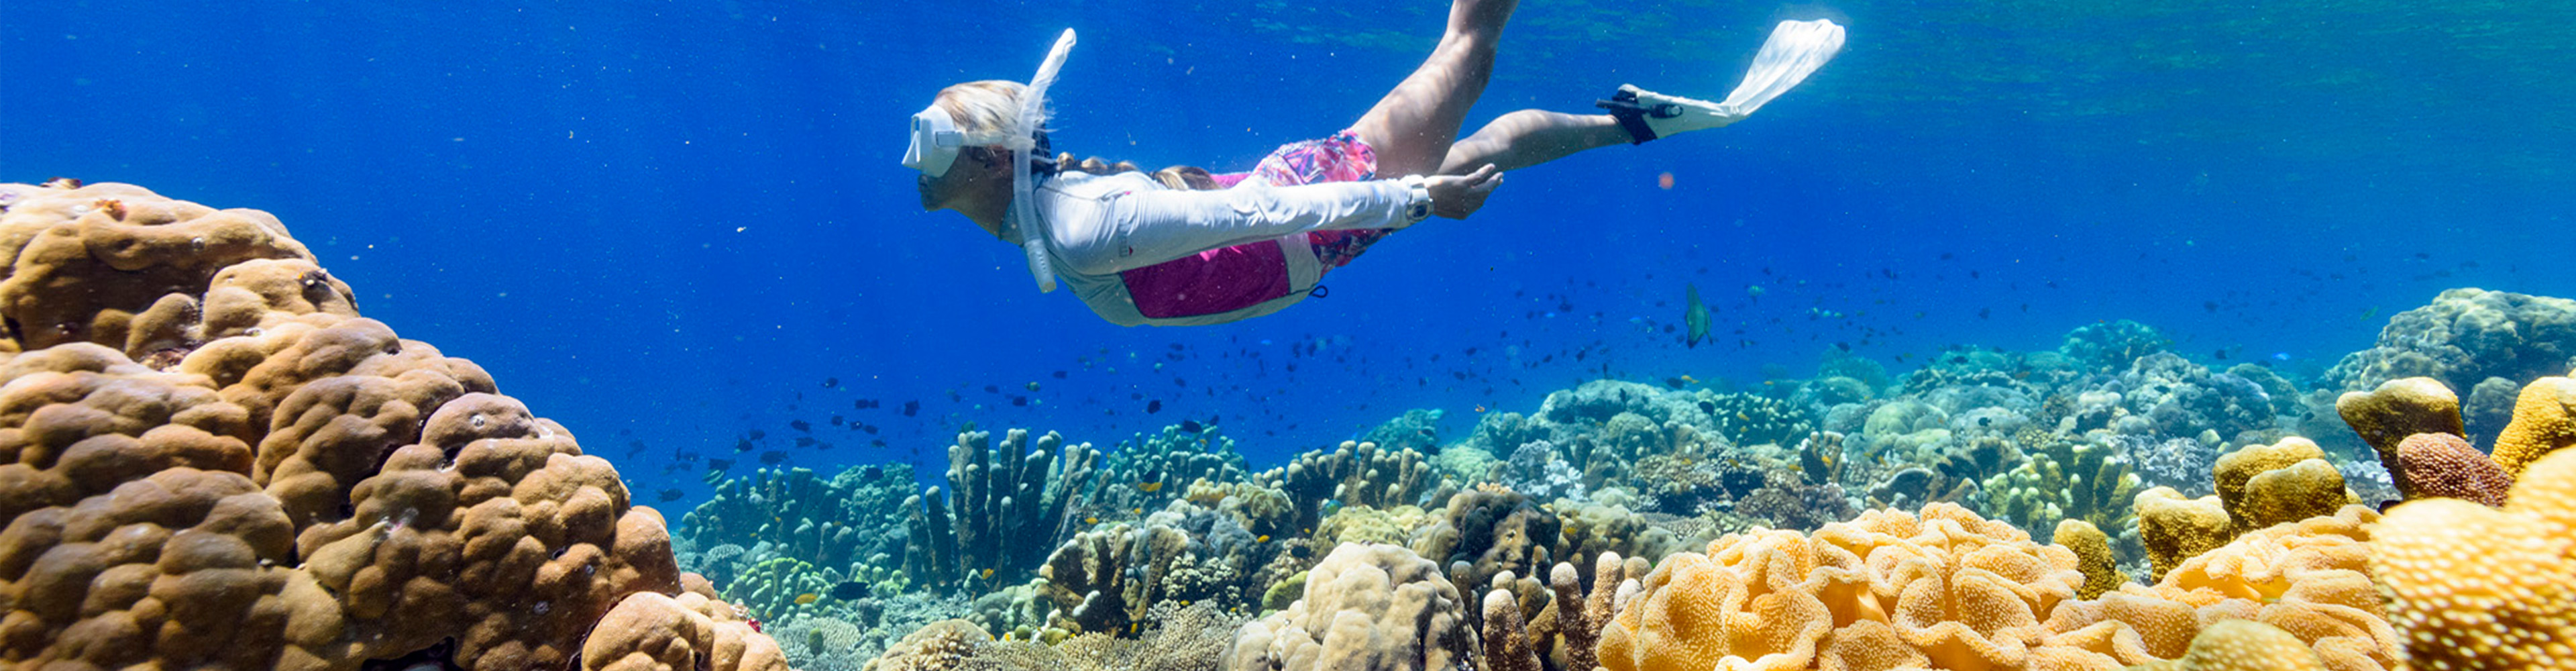 Solomon Islands Expedition